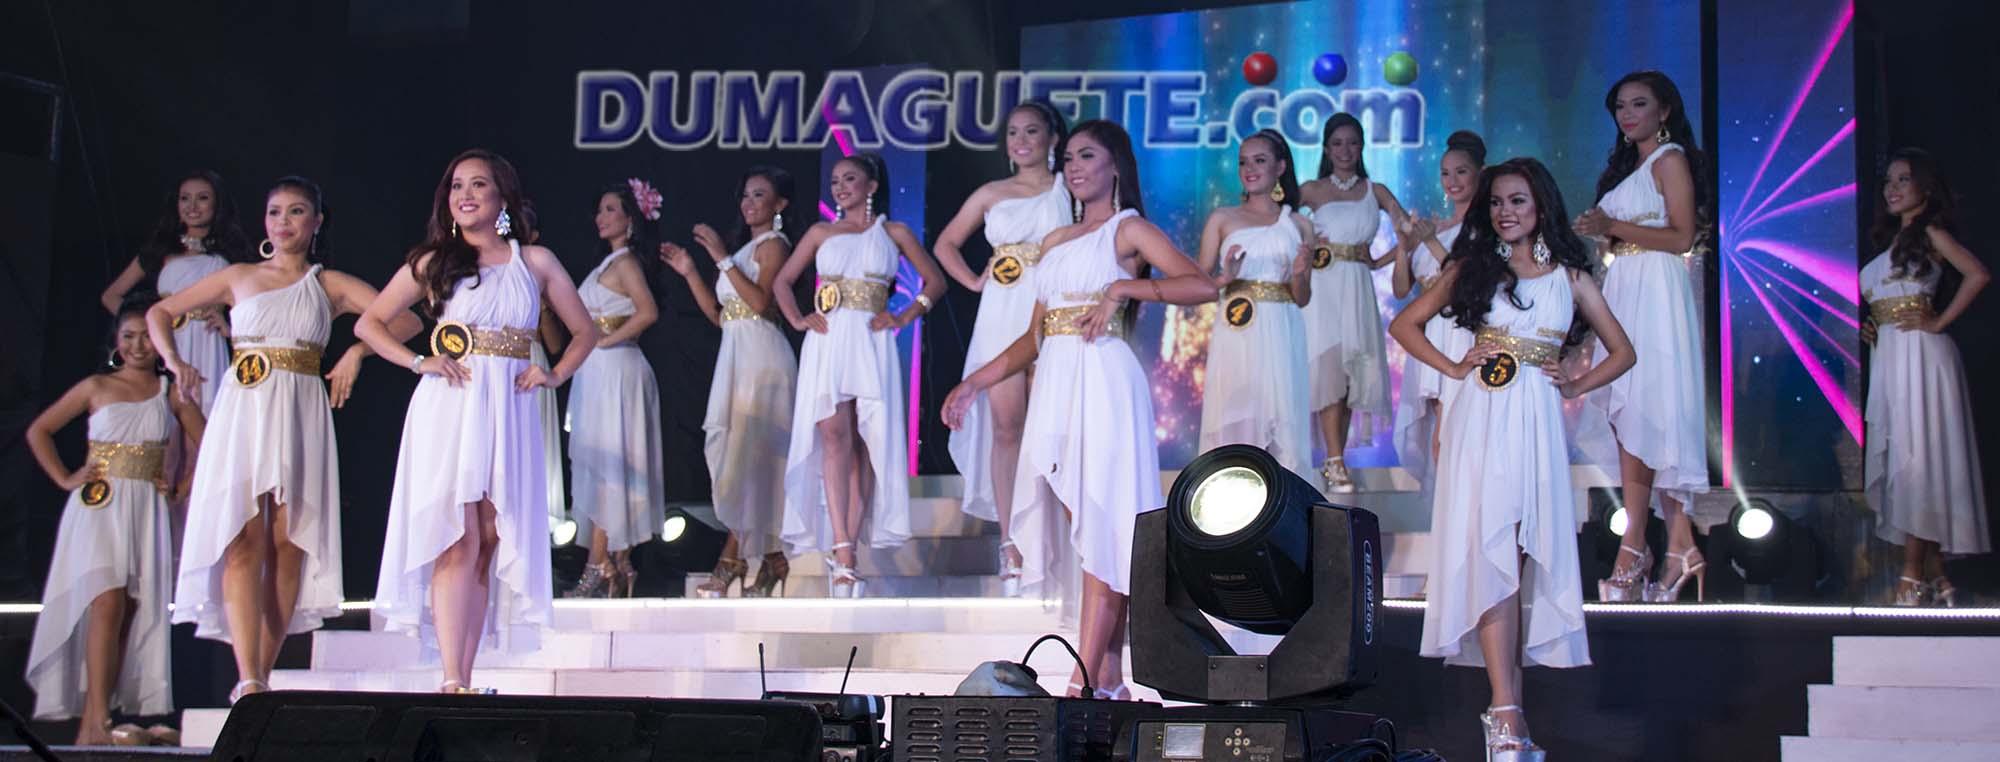 Miss Valencia 2018 - Coronation Night - Negros Oriental